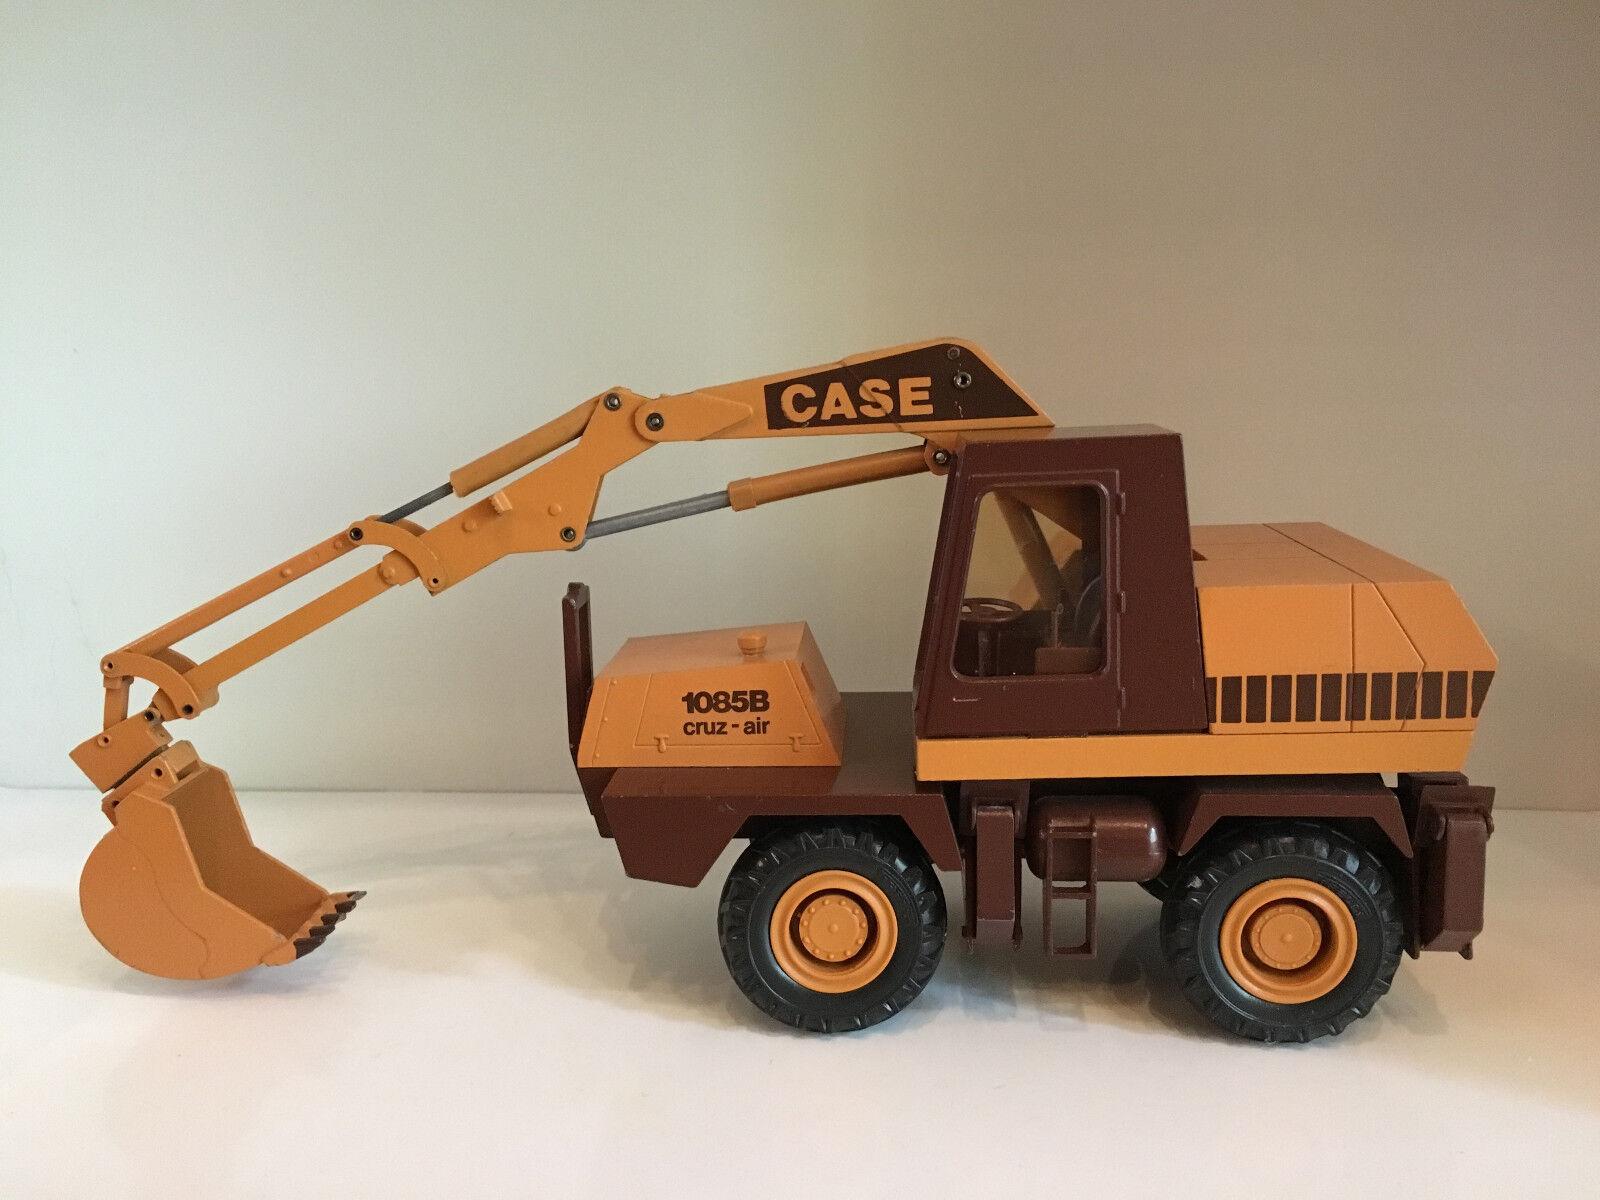 Case 1085 B cruz-air von Conrad 2964 in 1 35